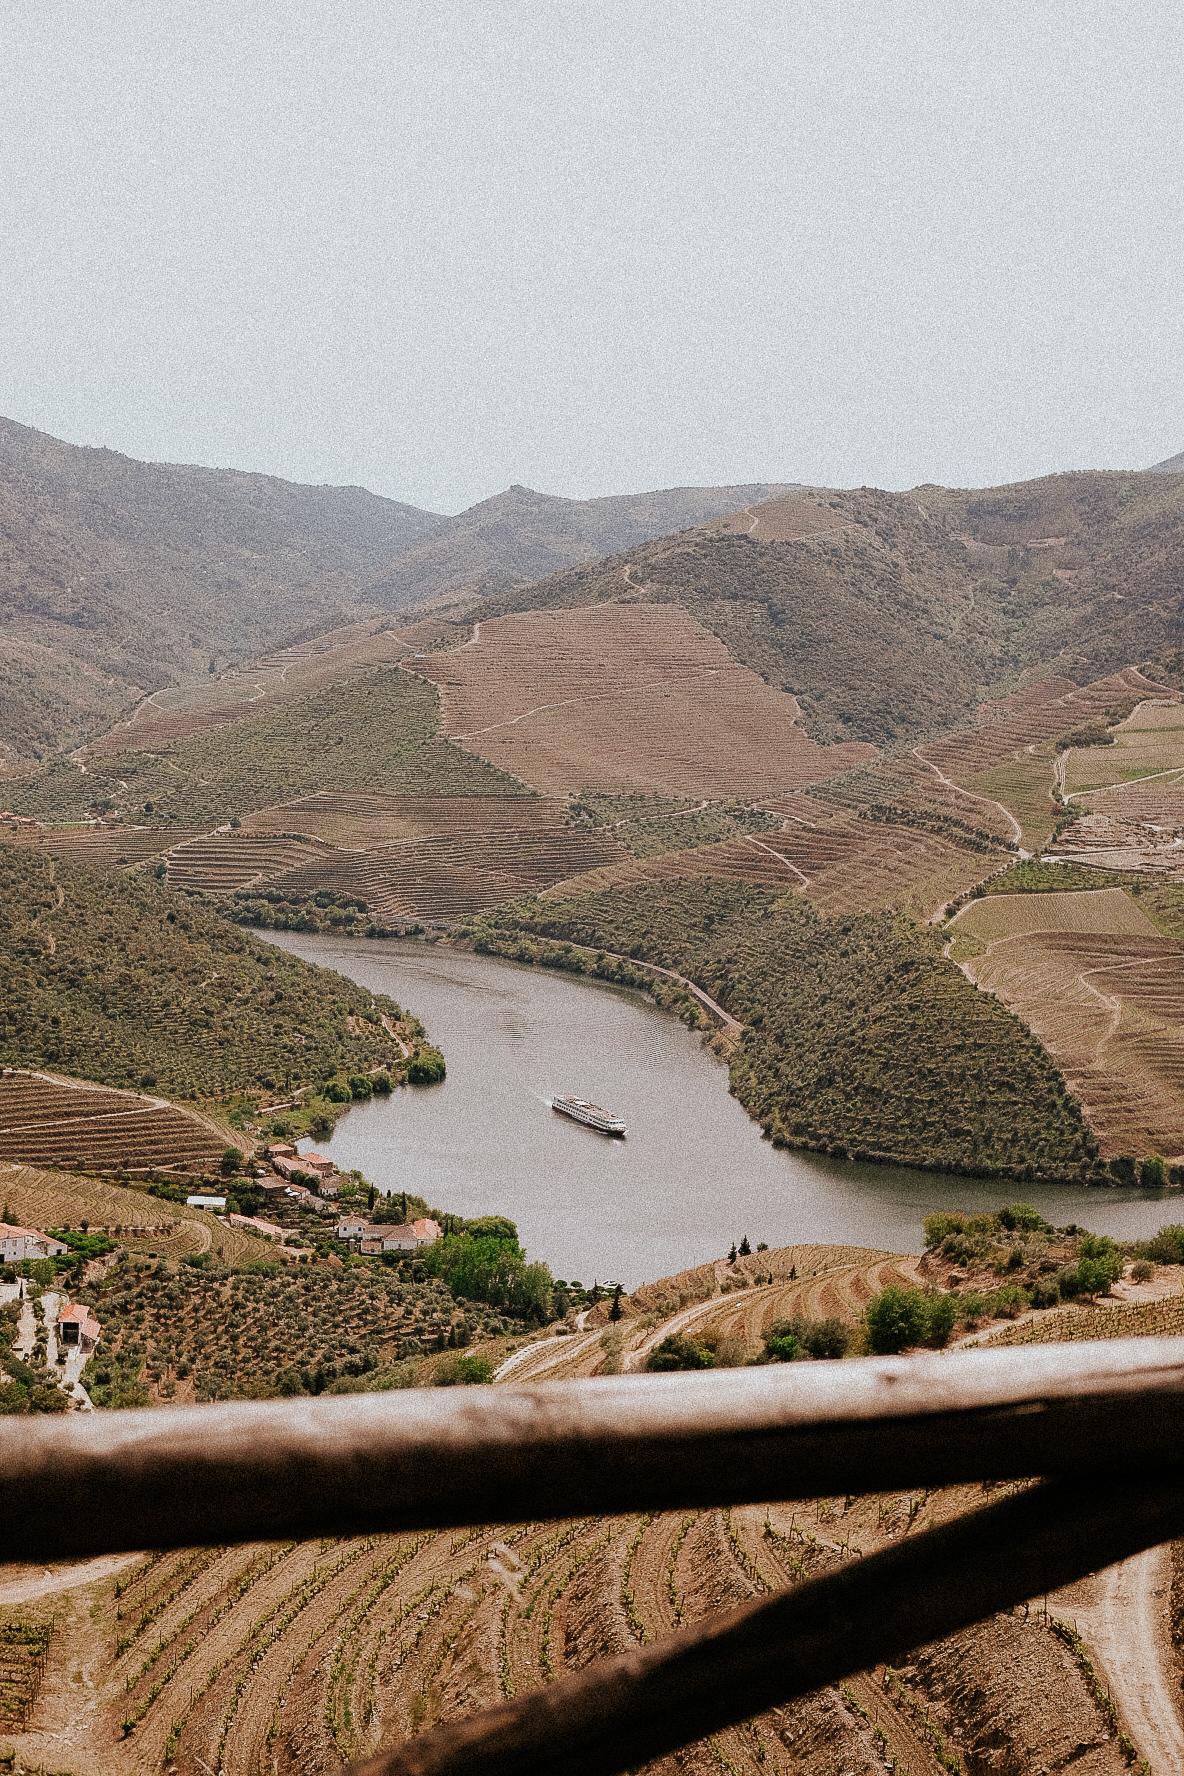 Mirador Rota do Douro